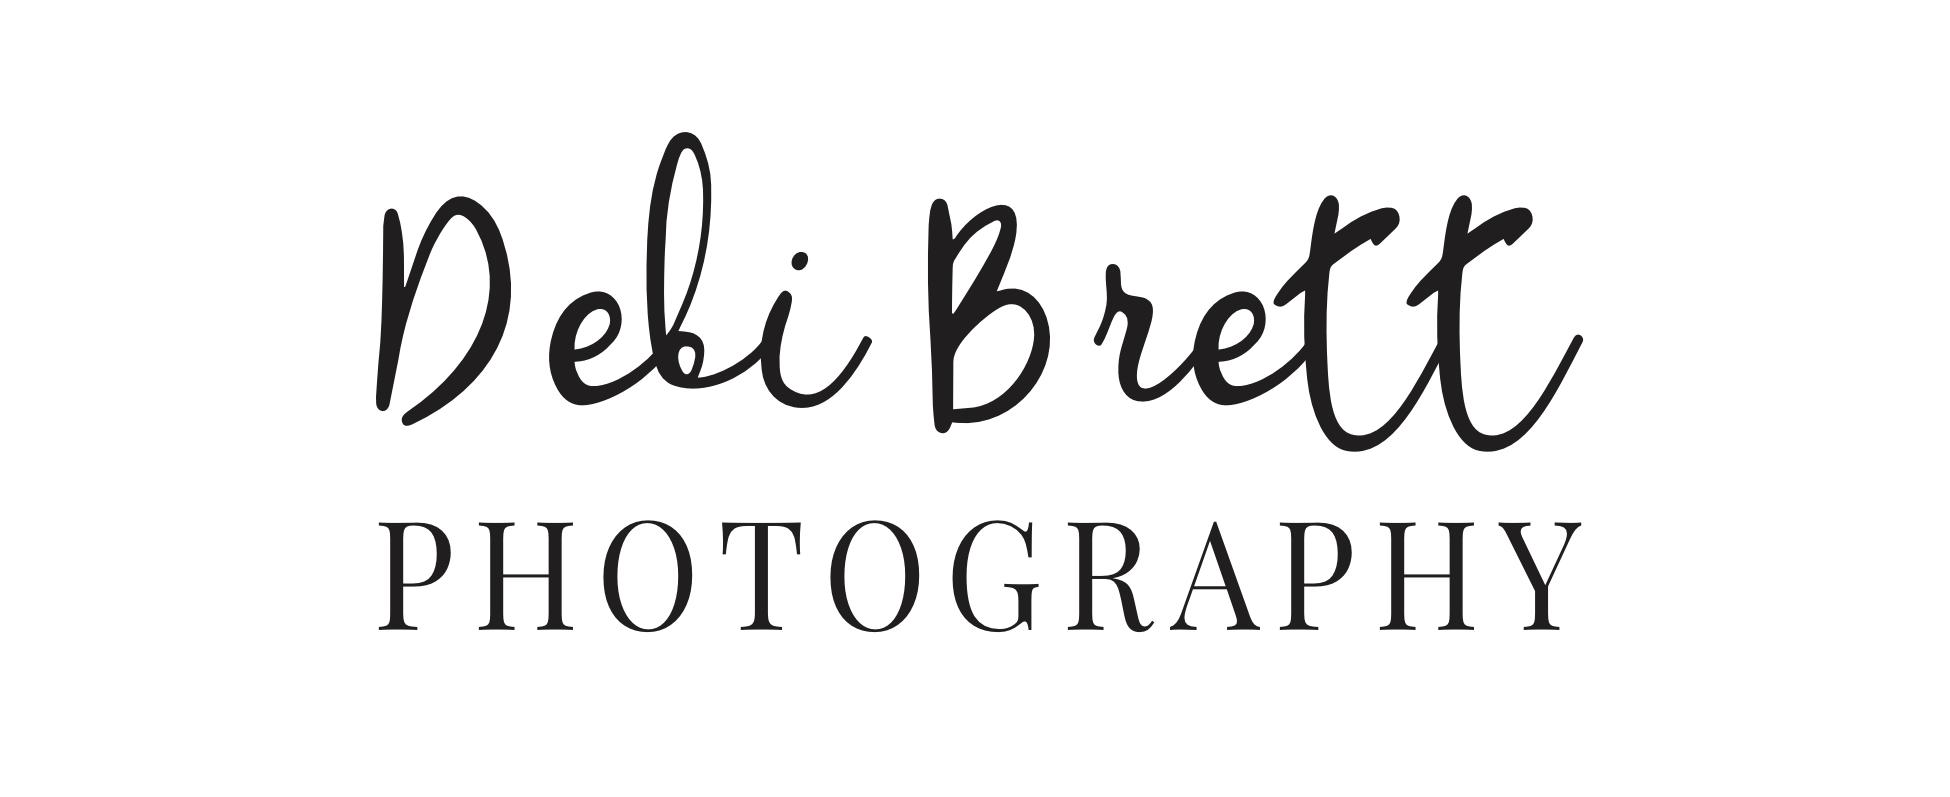 Debi Brett Photography